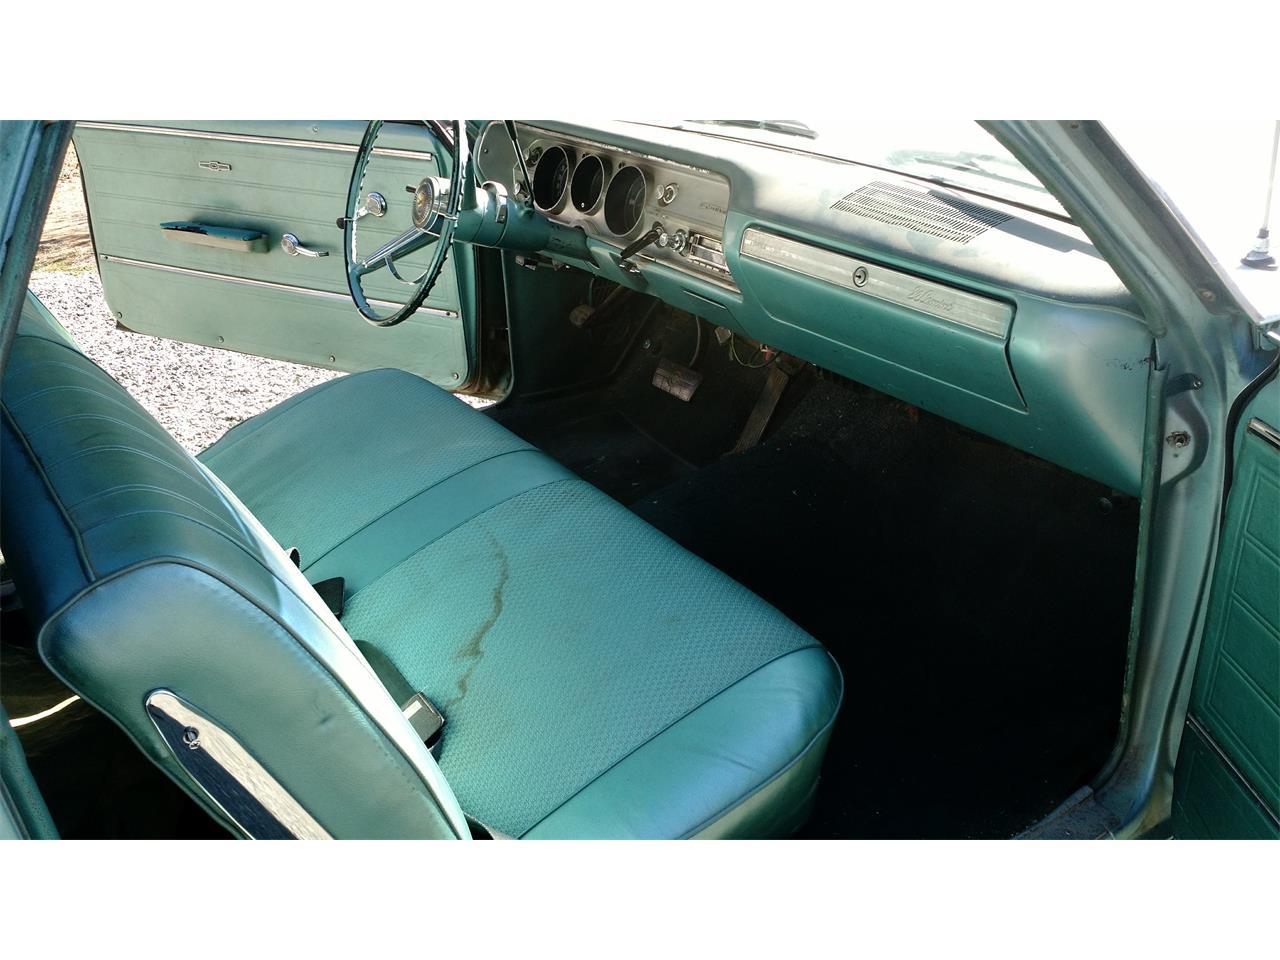 1965 Chevrolet El Camino (CC-1295243) for sale in Plymouth, California